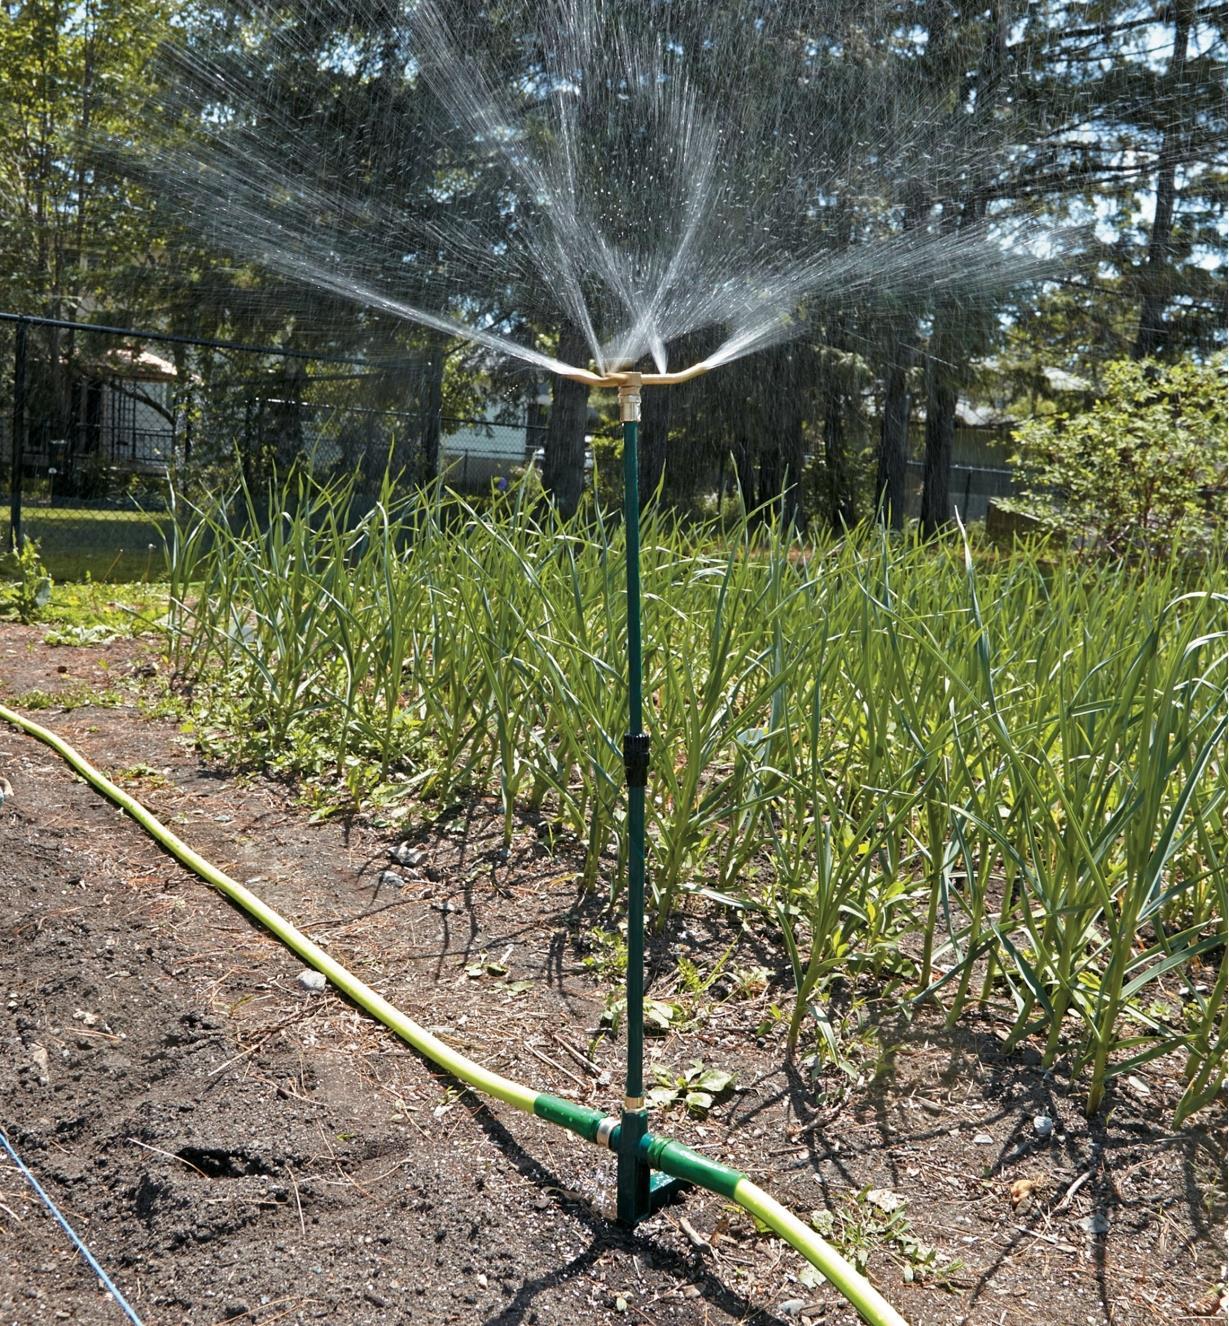 Telescoping Rain Sprinkler watering a garden